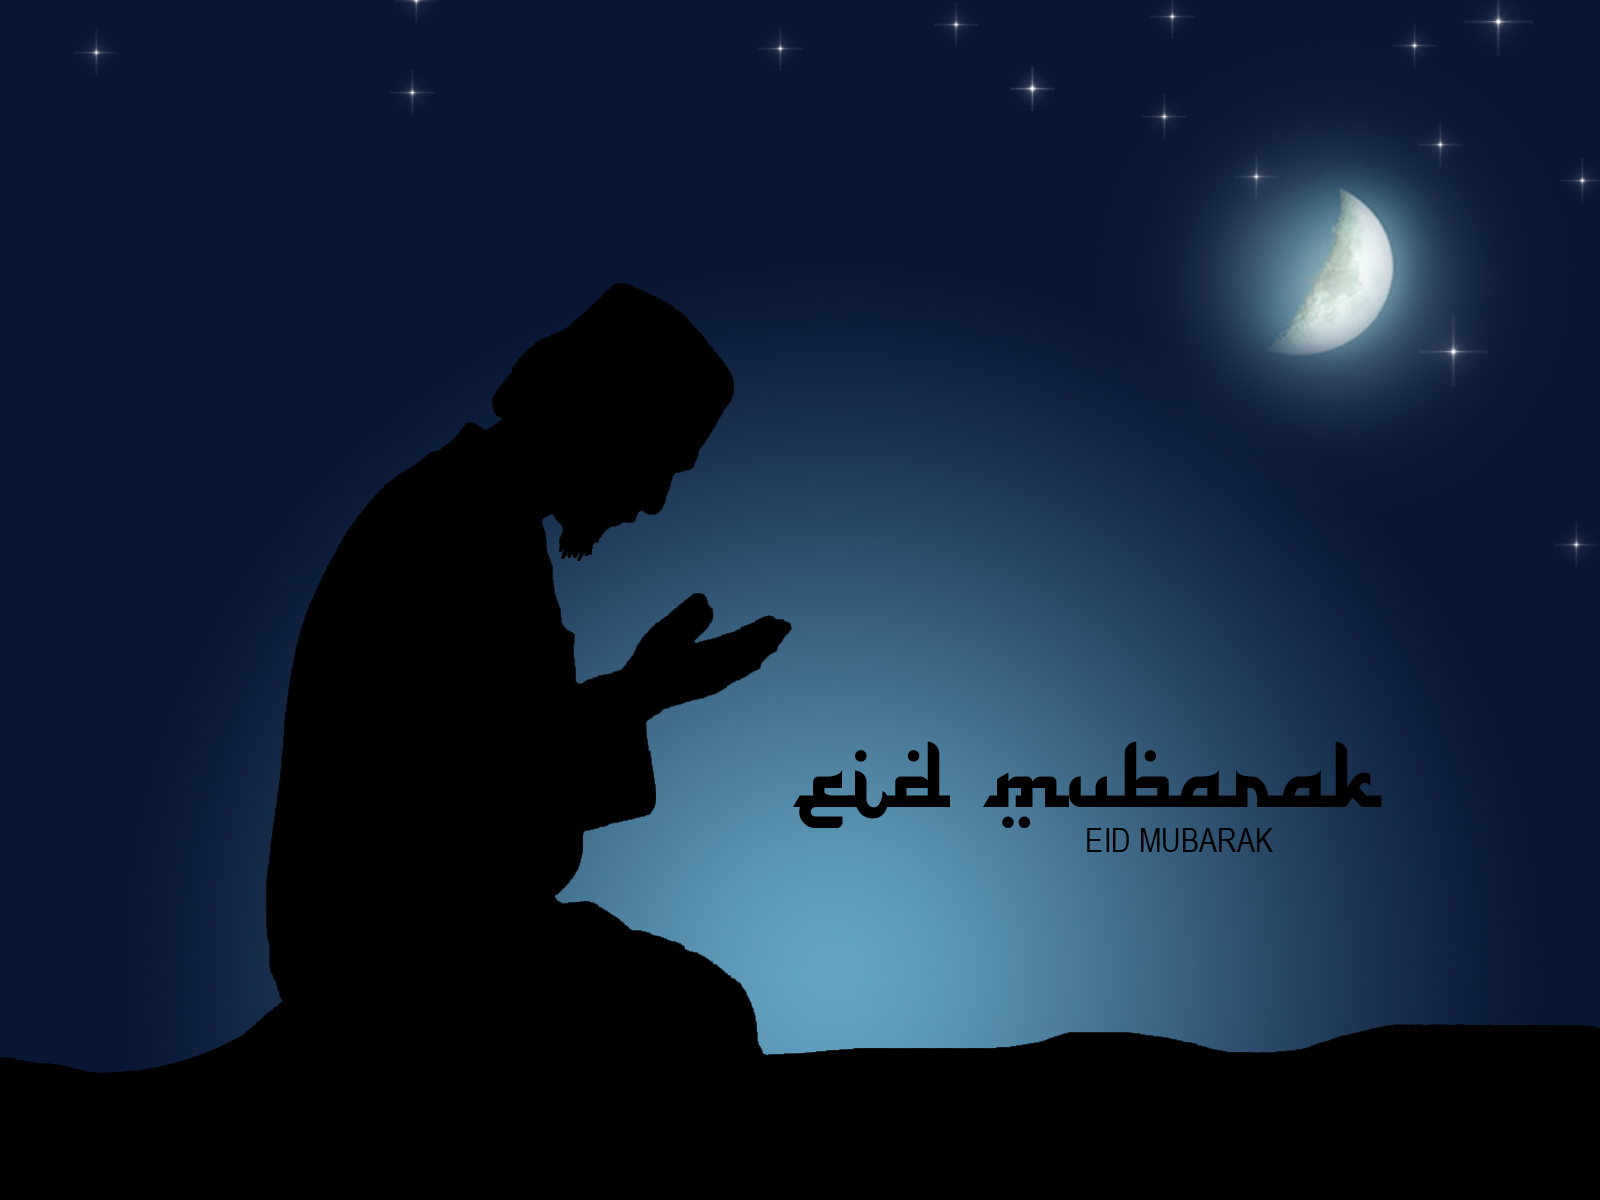 eid-mubarak02